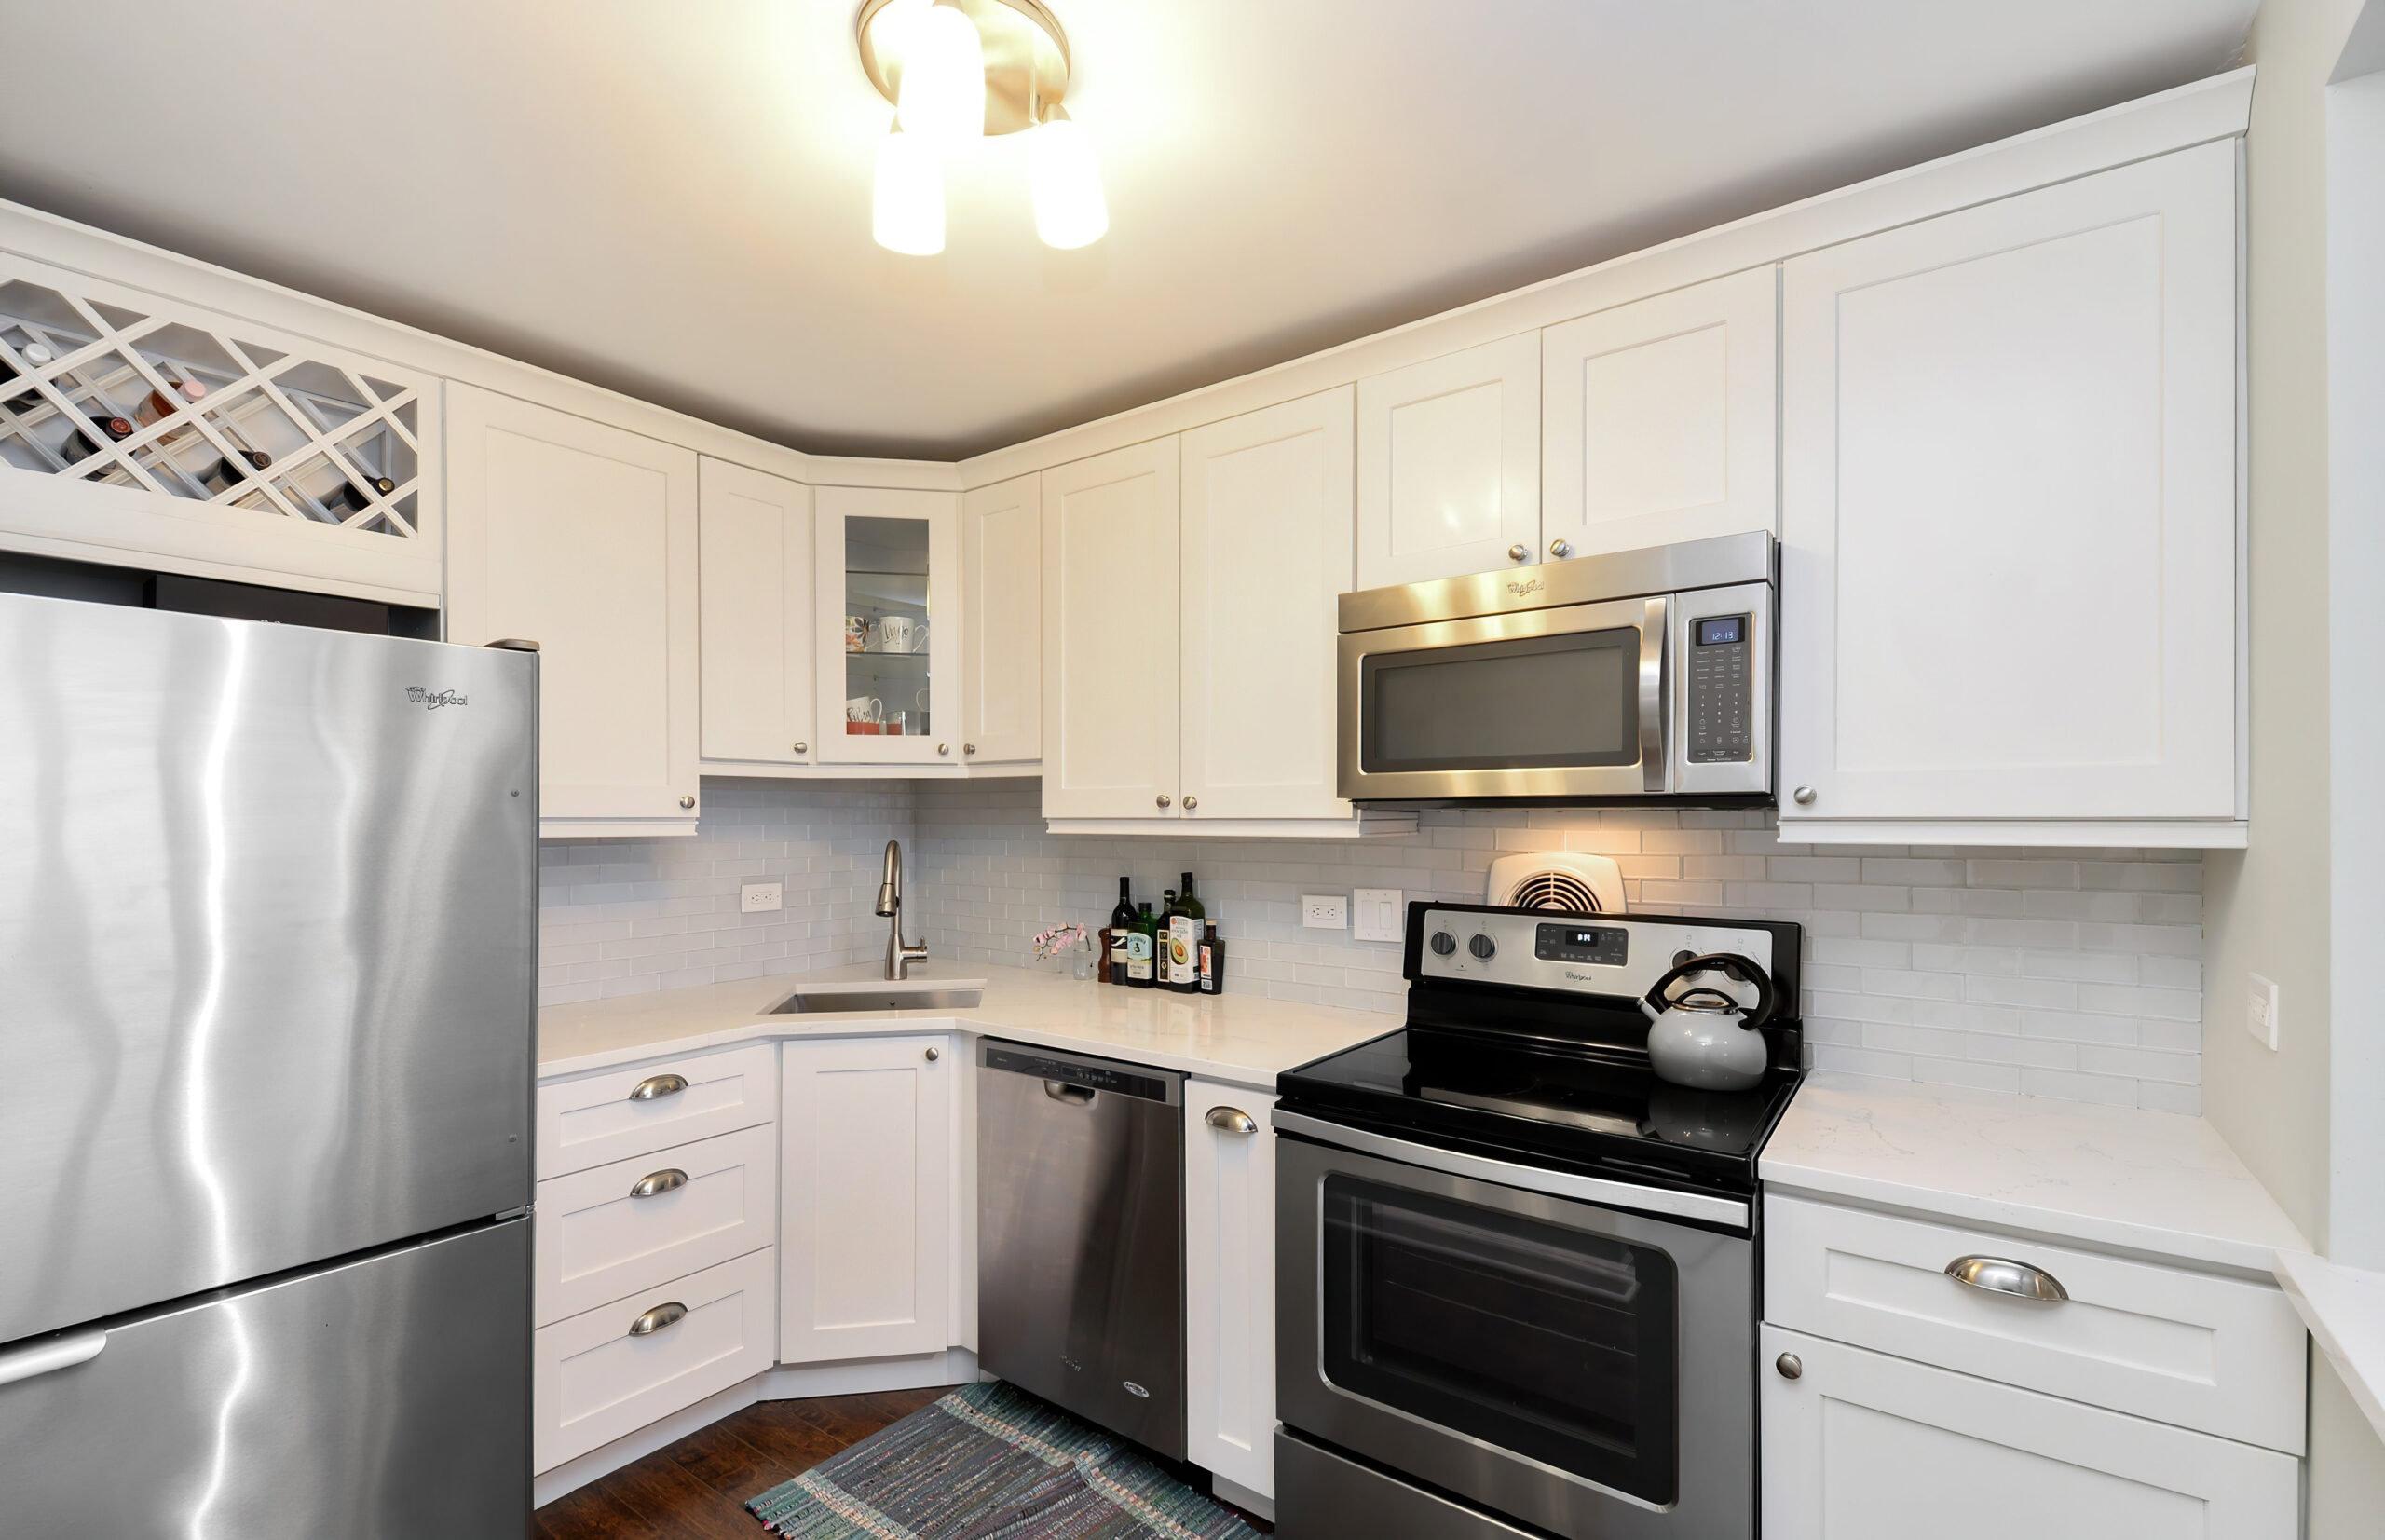 Chicago Gold Coast Condo Kitchen Renovation